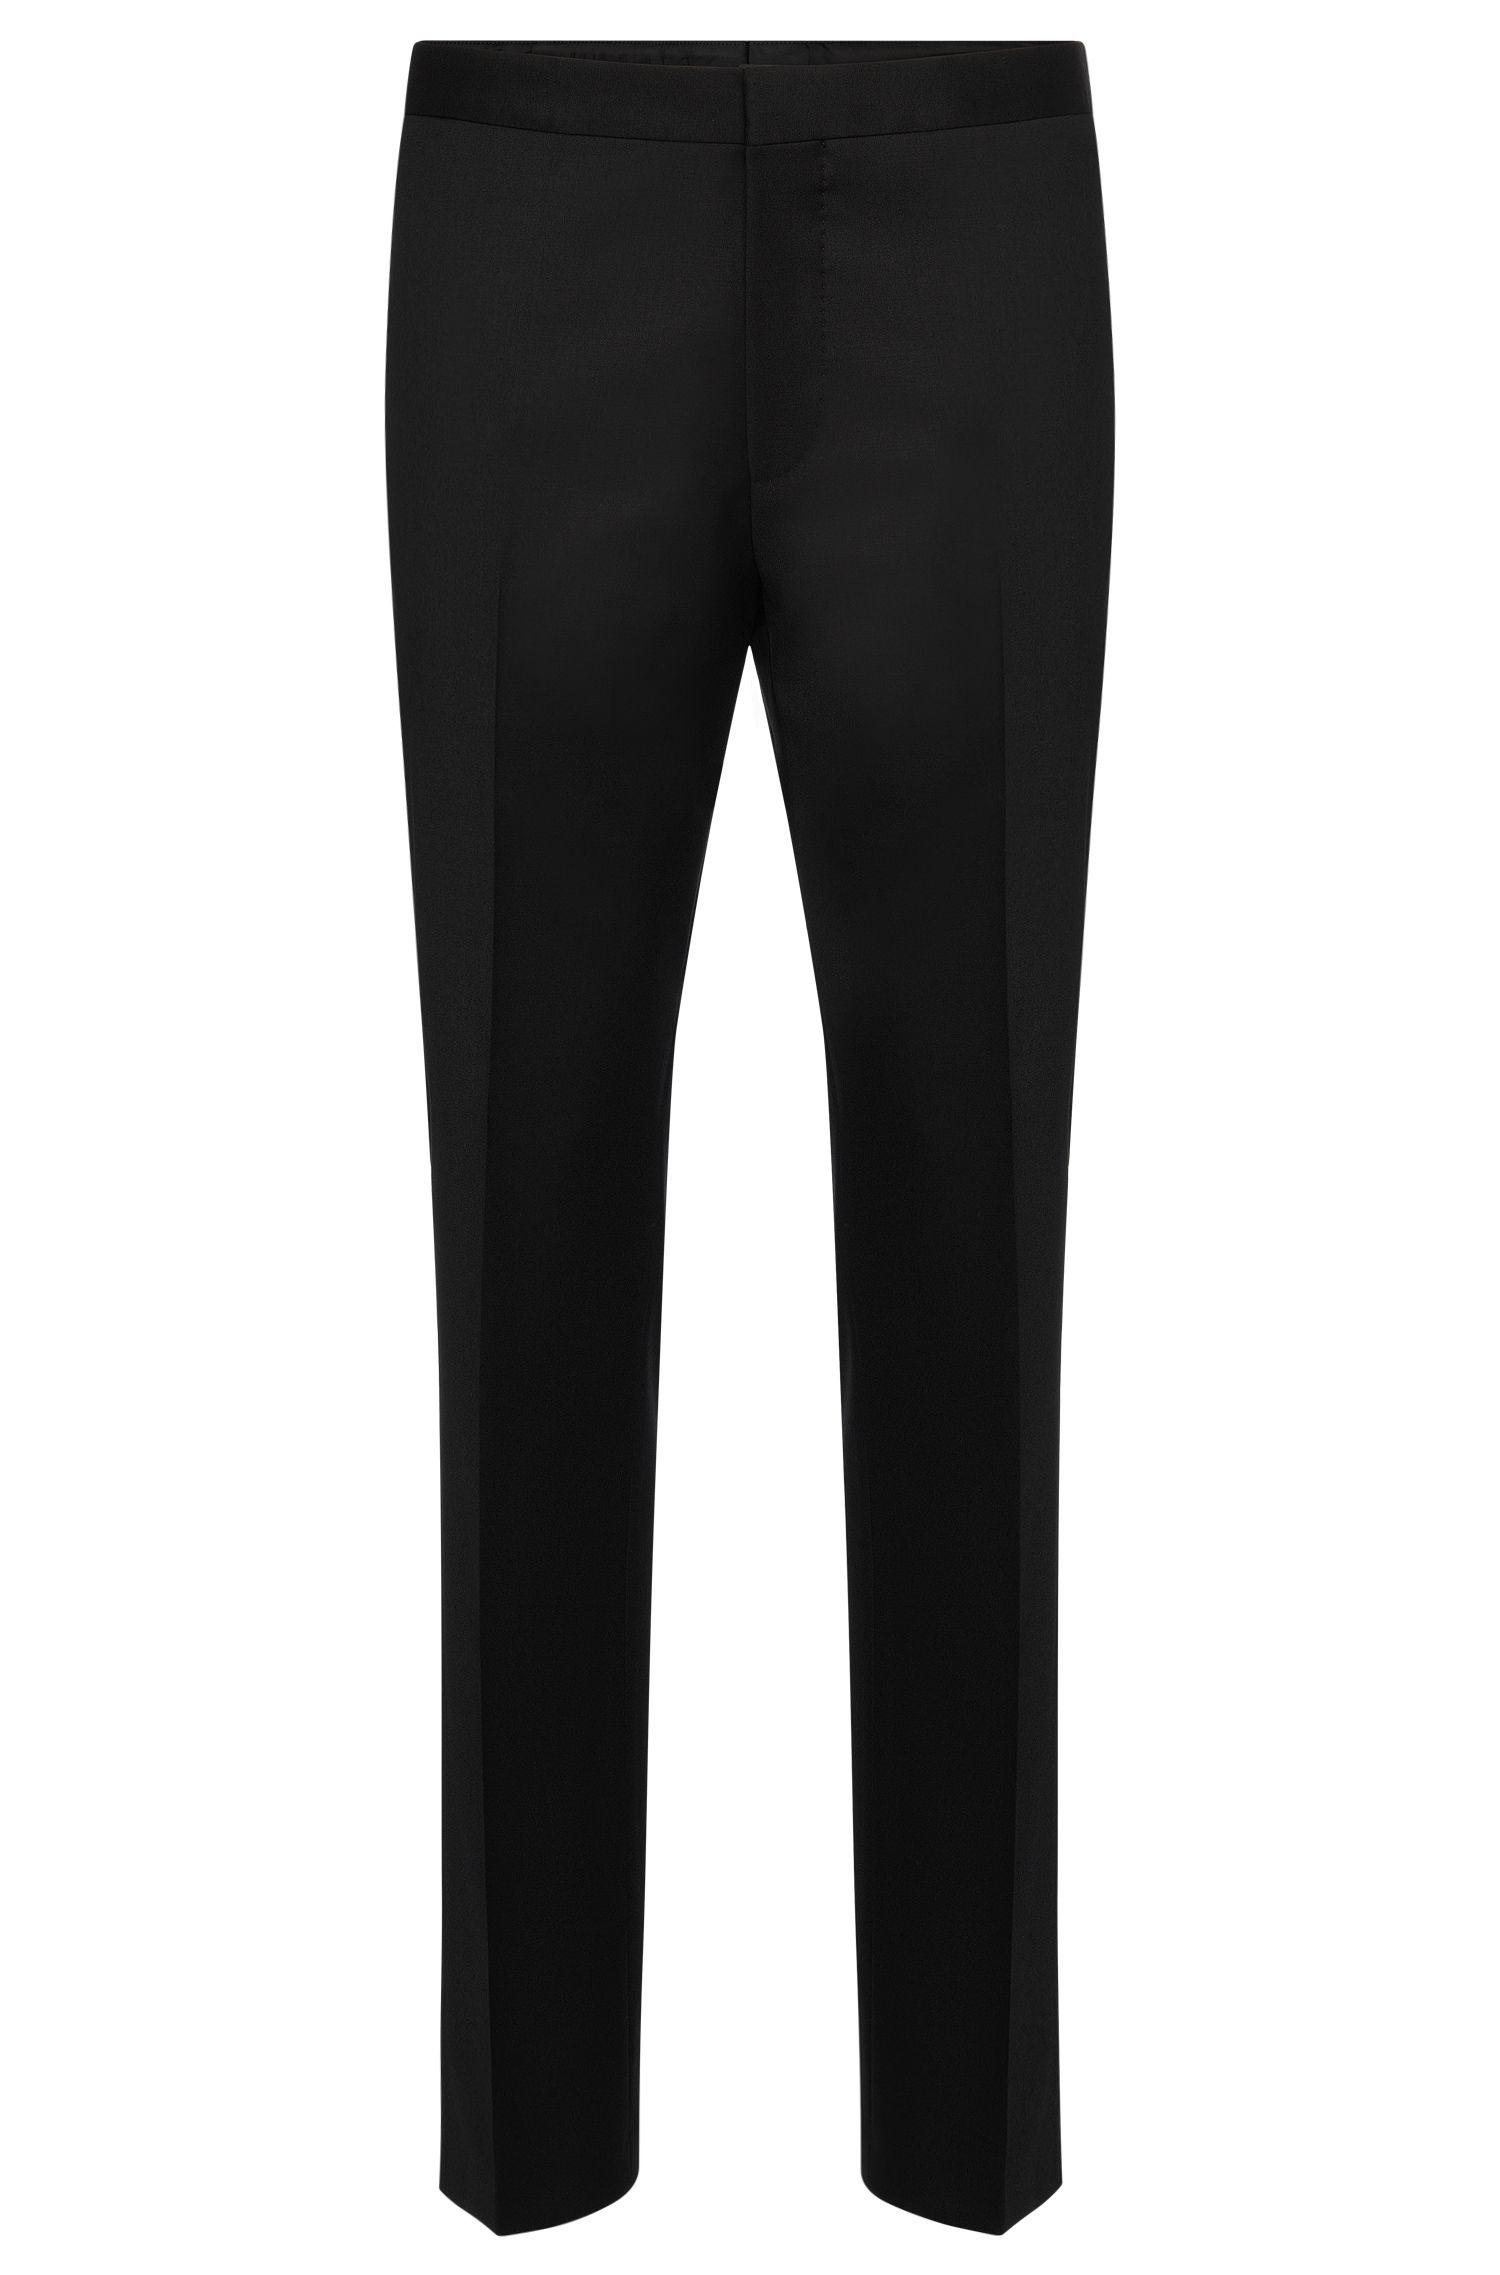 'Godwin' | Slim Fit, Super 120 Italian Virgin Wool Dress Pants